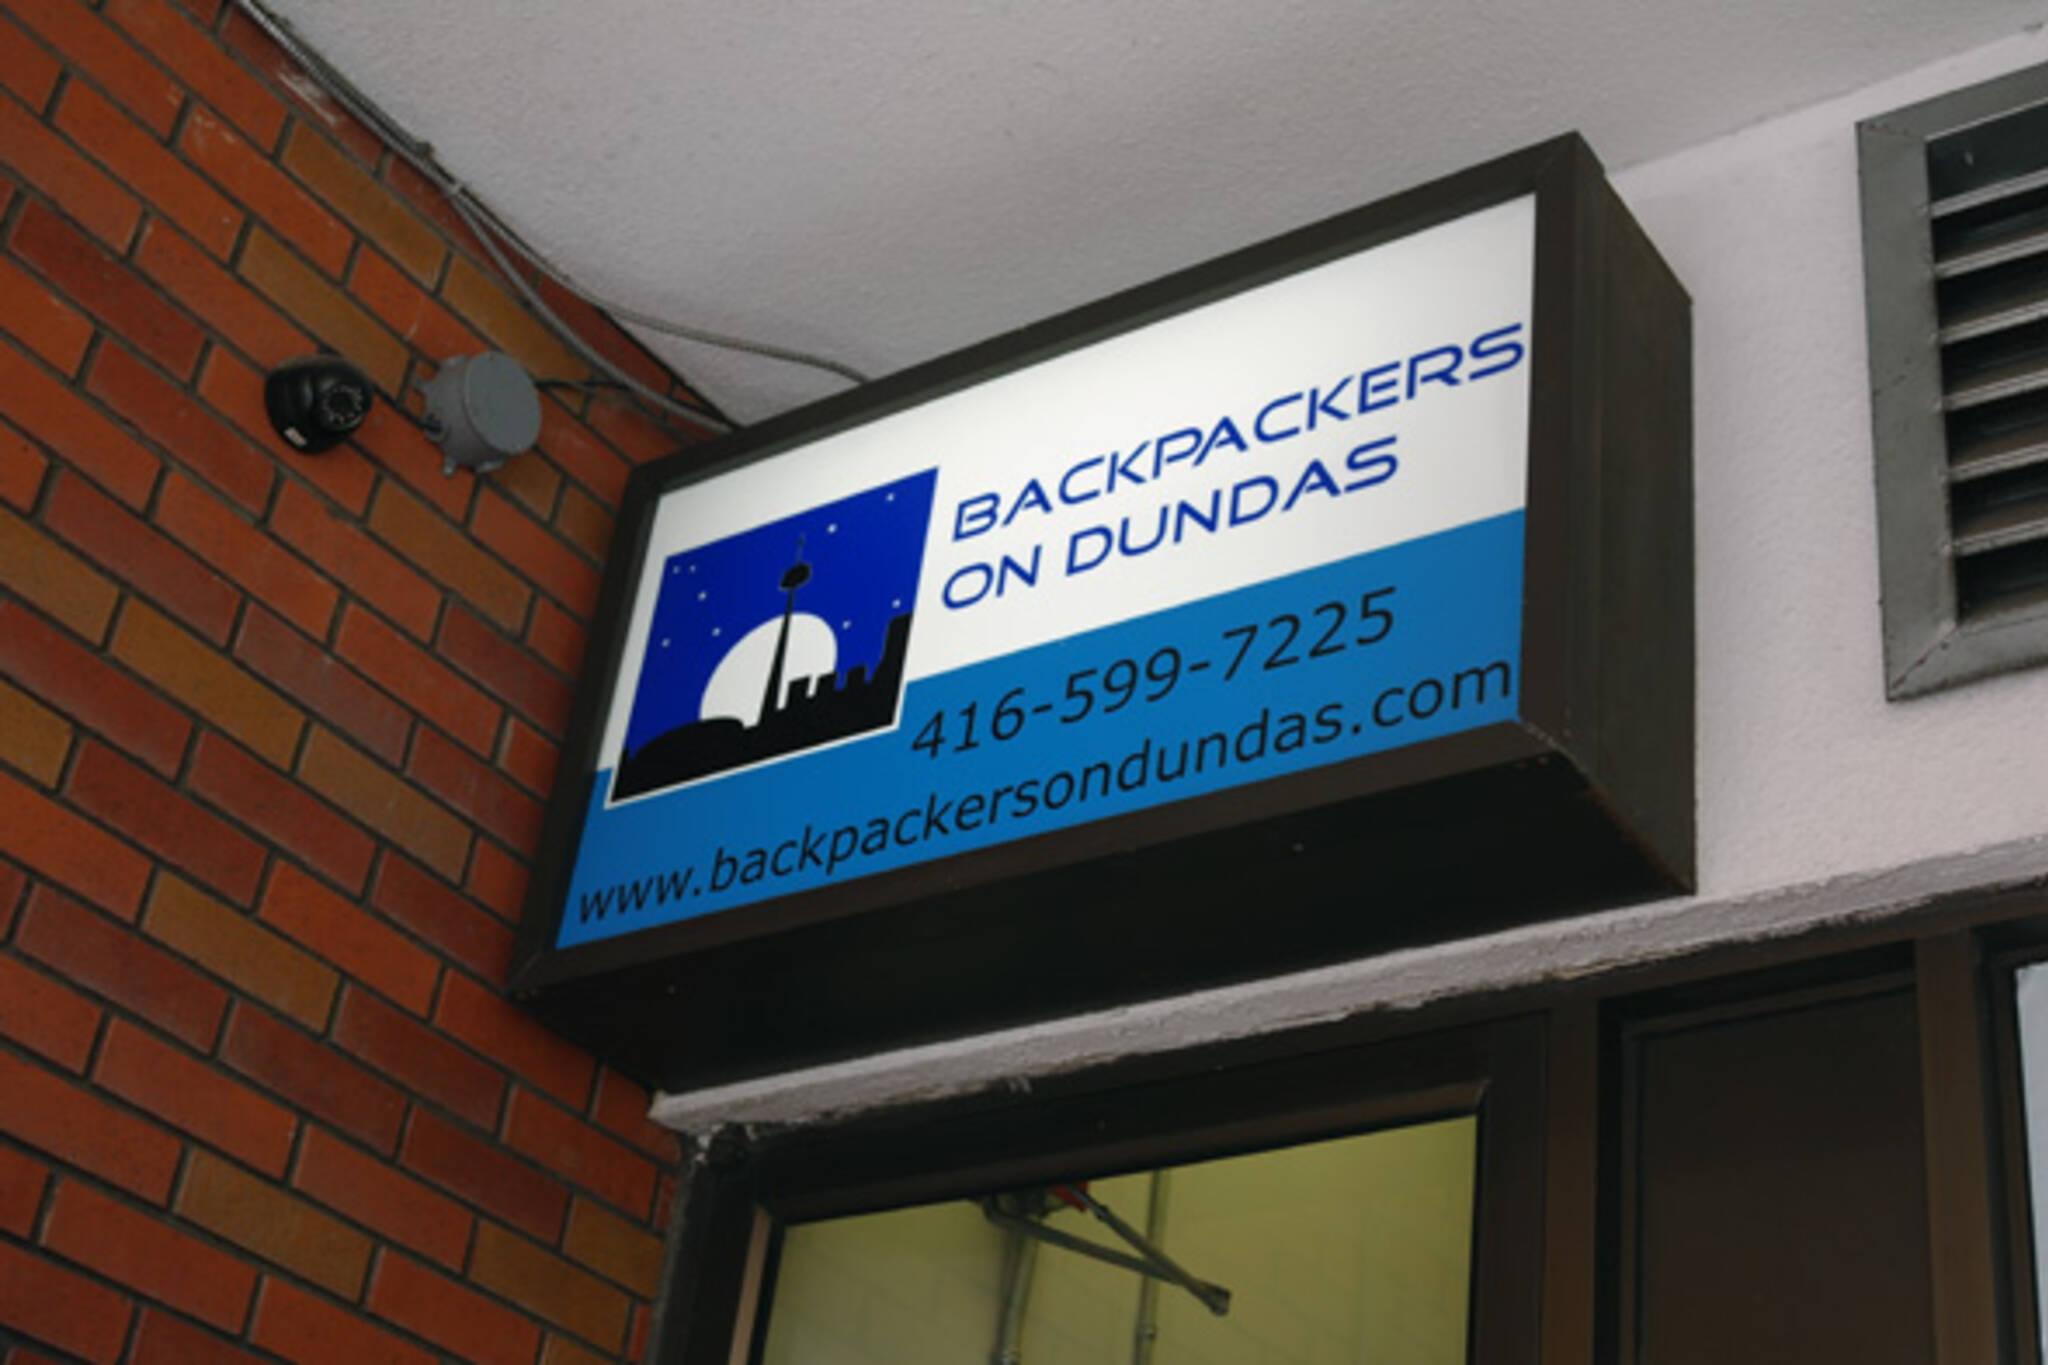 Backpackers Dundas